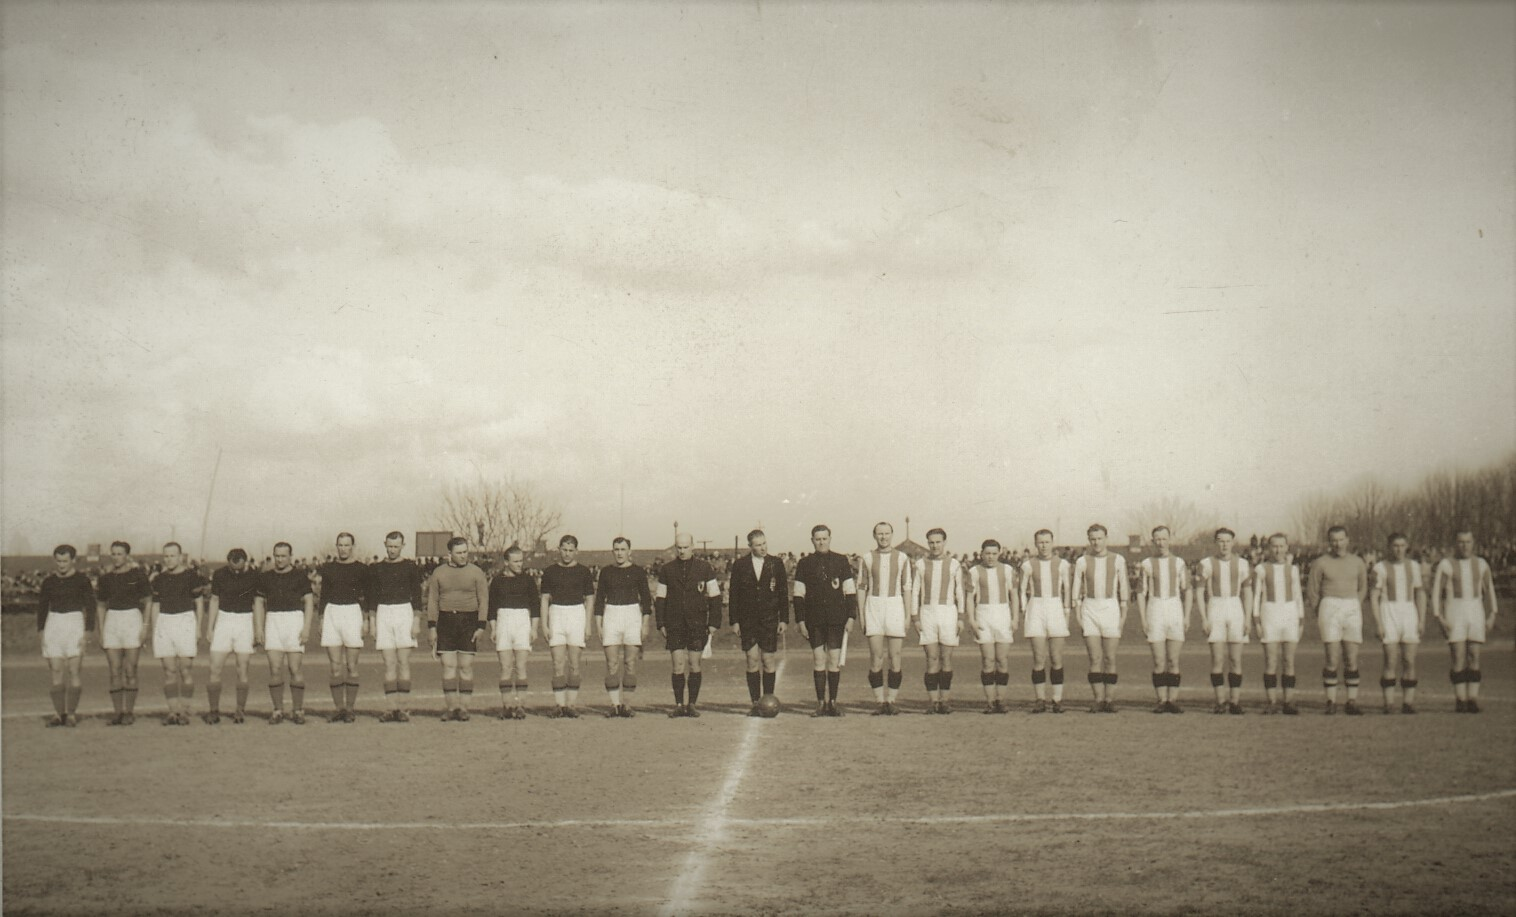 85_253_62_5_labdarugo_merkozes_a_diosgyori_stadionban_1939-44.jpg